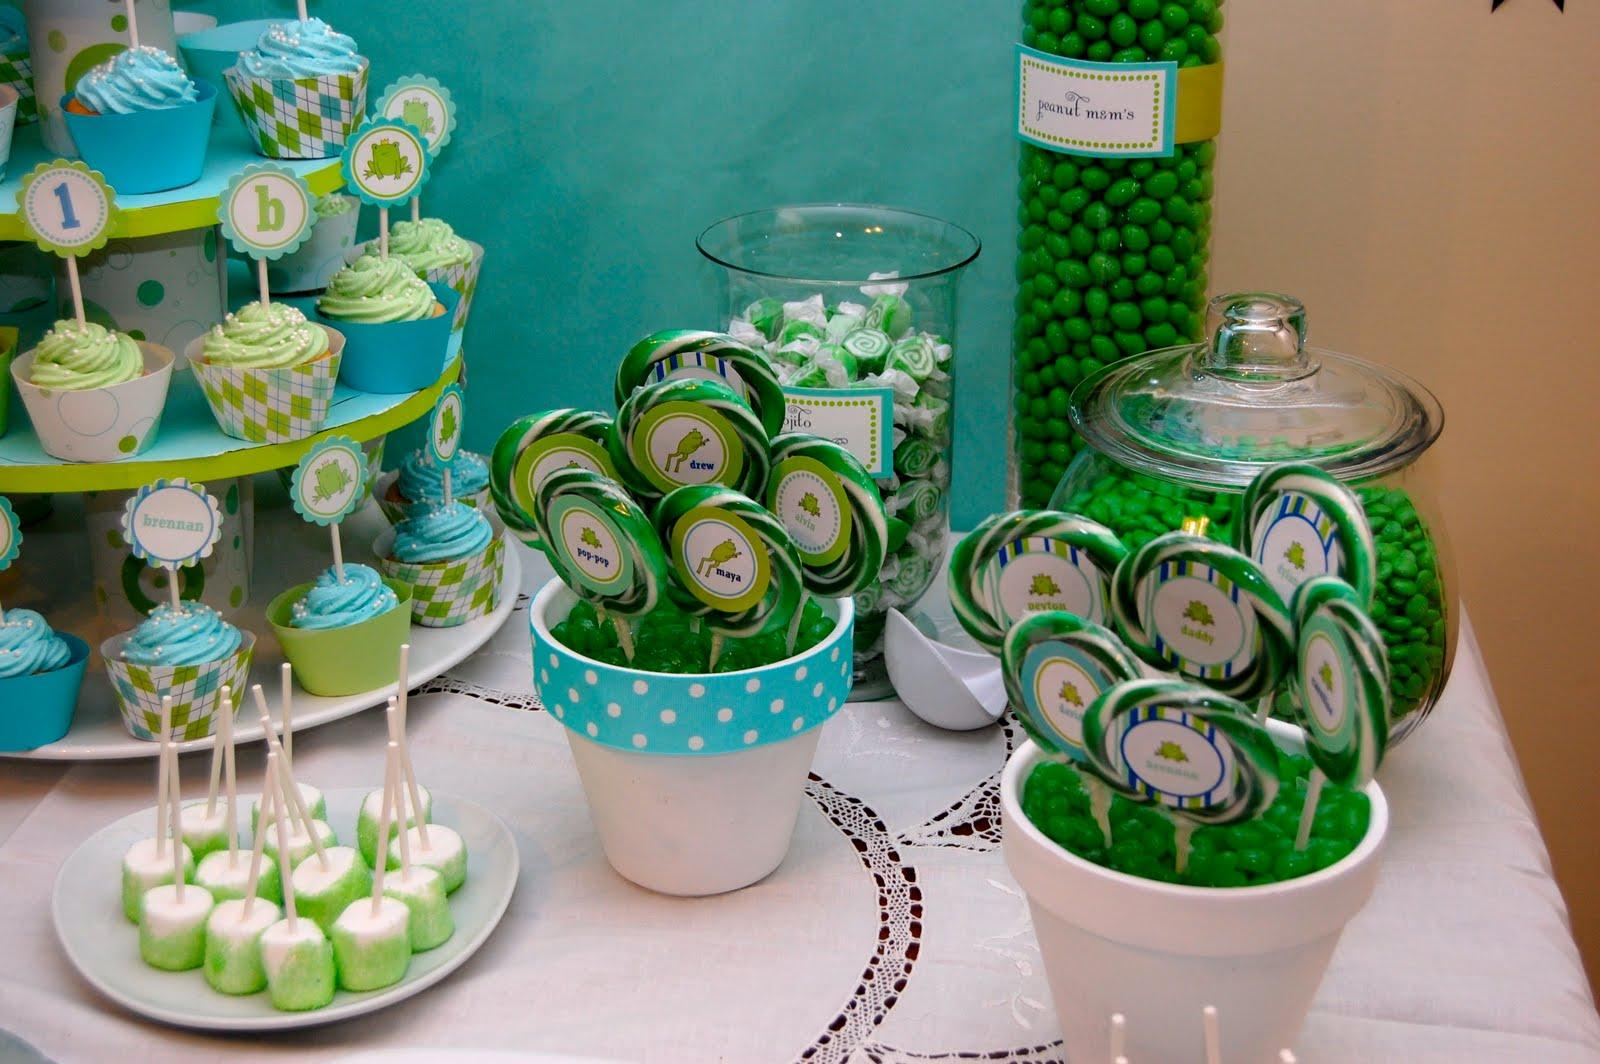 Sweetyfudge Bakery (001925672-X): Kak Azlina - Candy